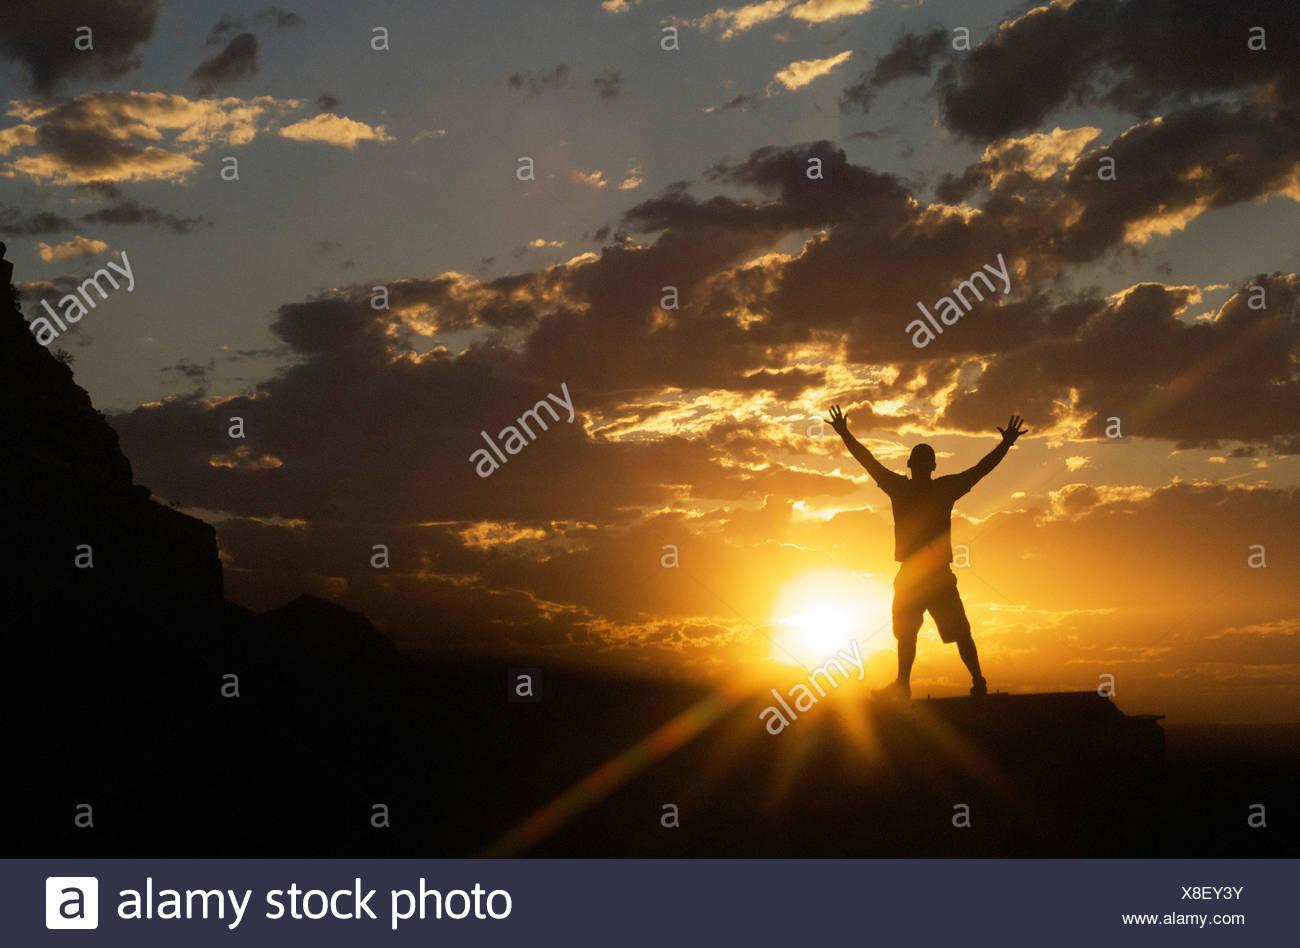 Naturaleza paisajes y conceptos inspiradores: silueta de hombre celebrando el espectacular atardecer cielo de pie con los brazos extendidos amplia Imagen De Stock